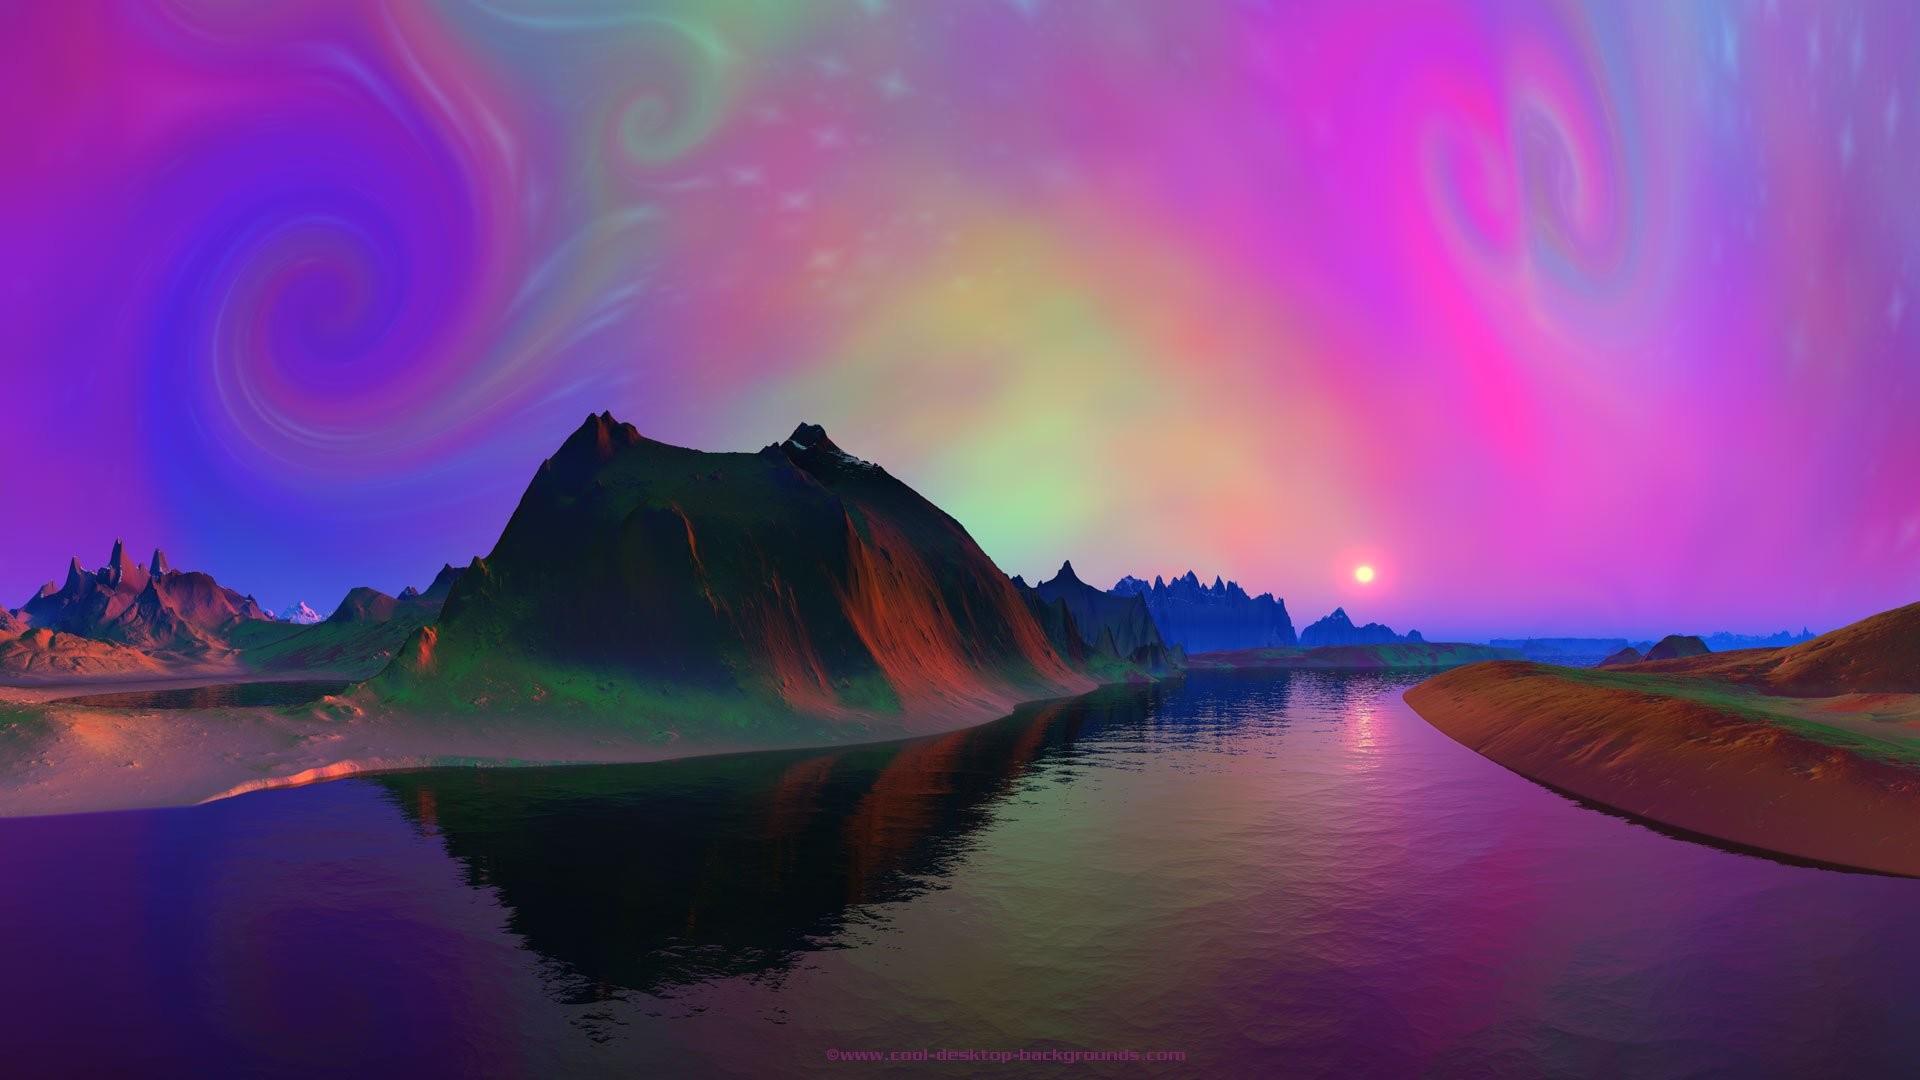 65 Psychedelic Desktop Wallpaper Hd